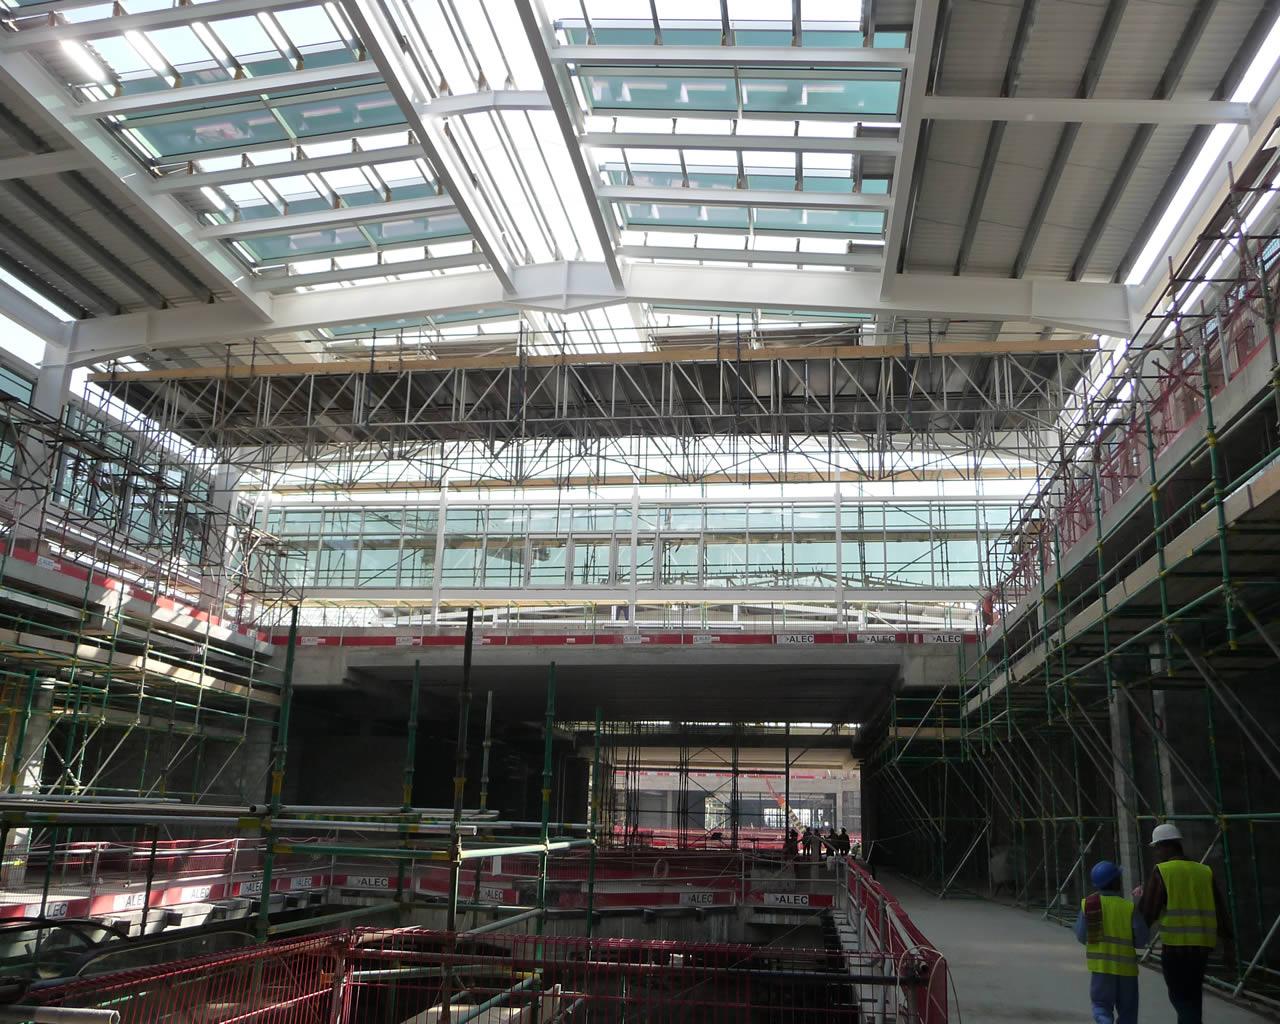 Mirdiff Mall